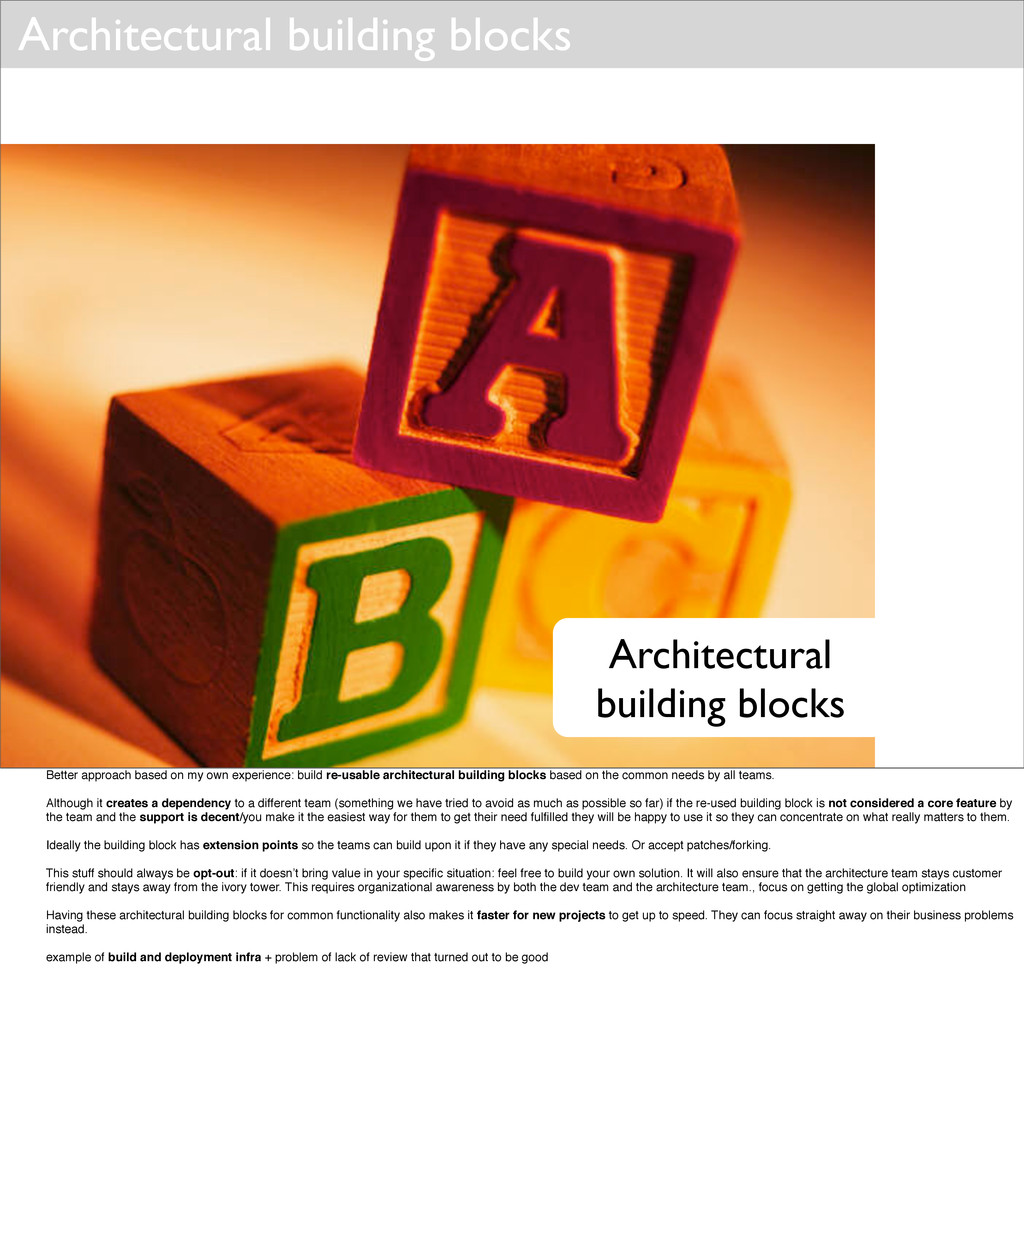 Architectural building blocks Architectural bui...